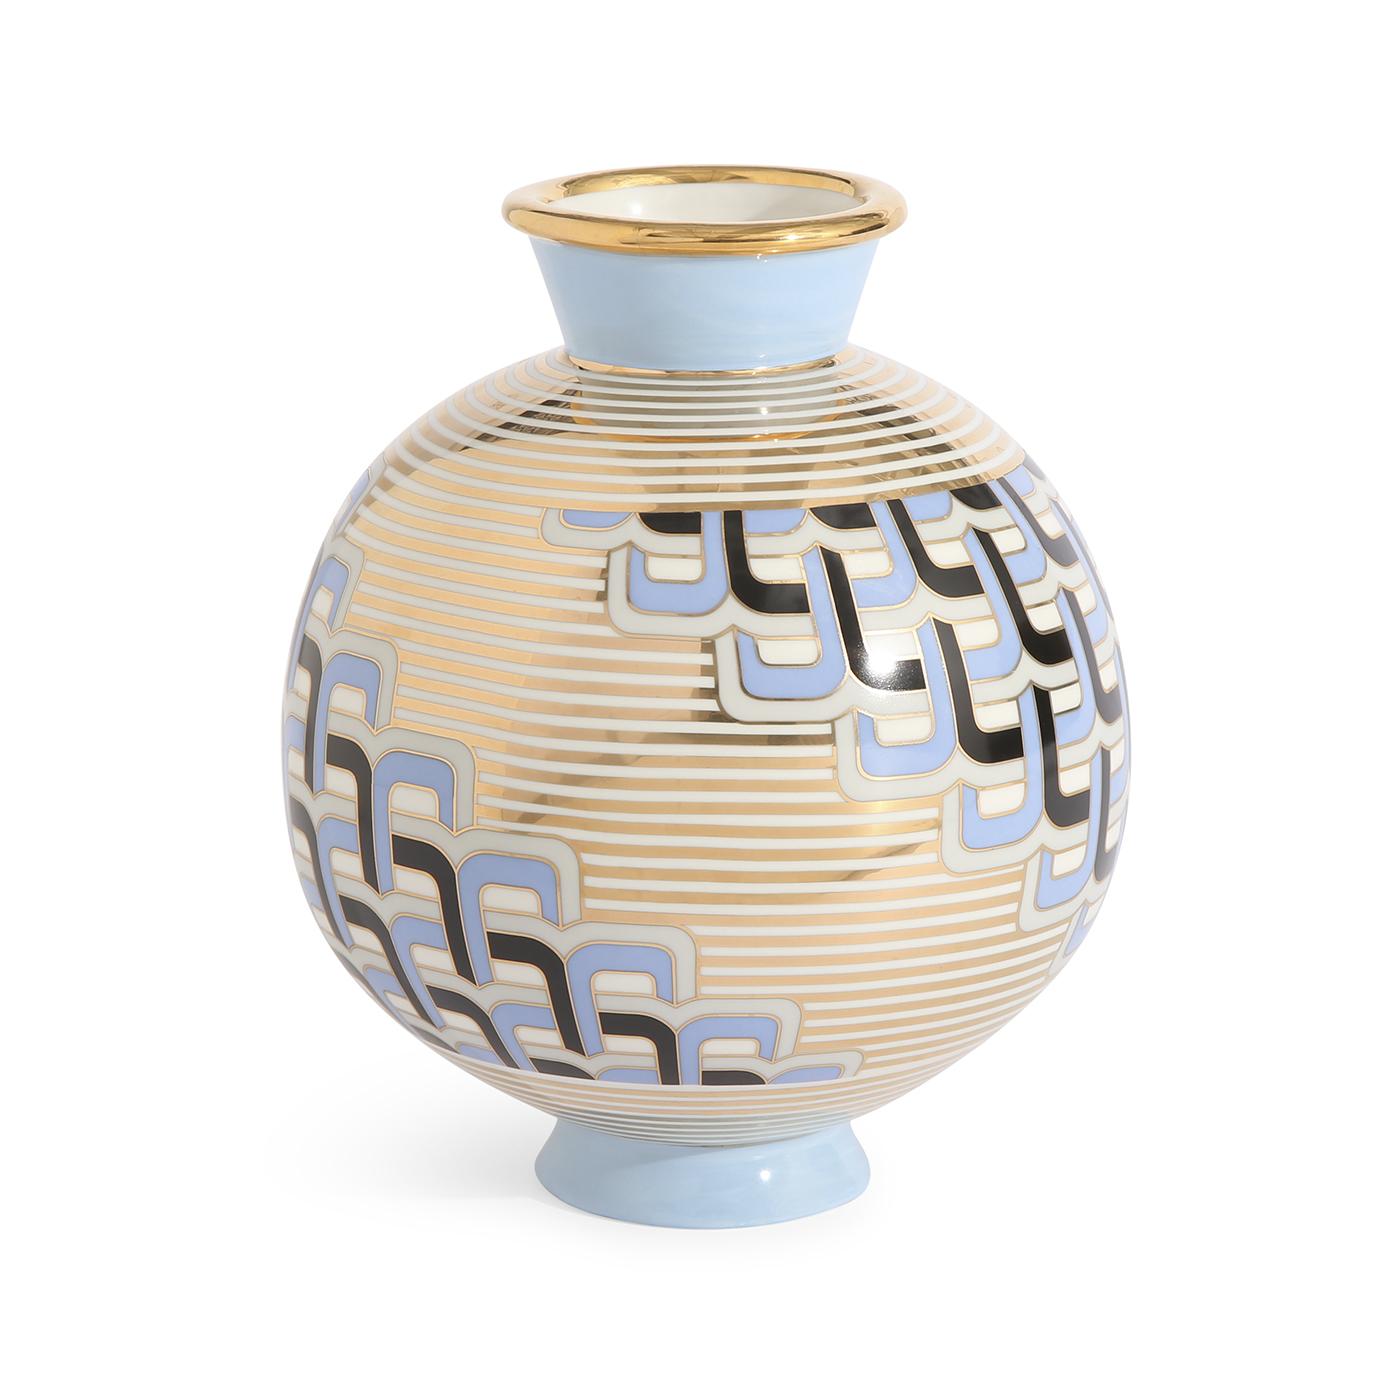 Jonathan Adler Versailles Puzzles Vase